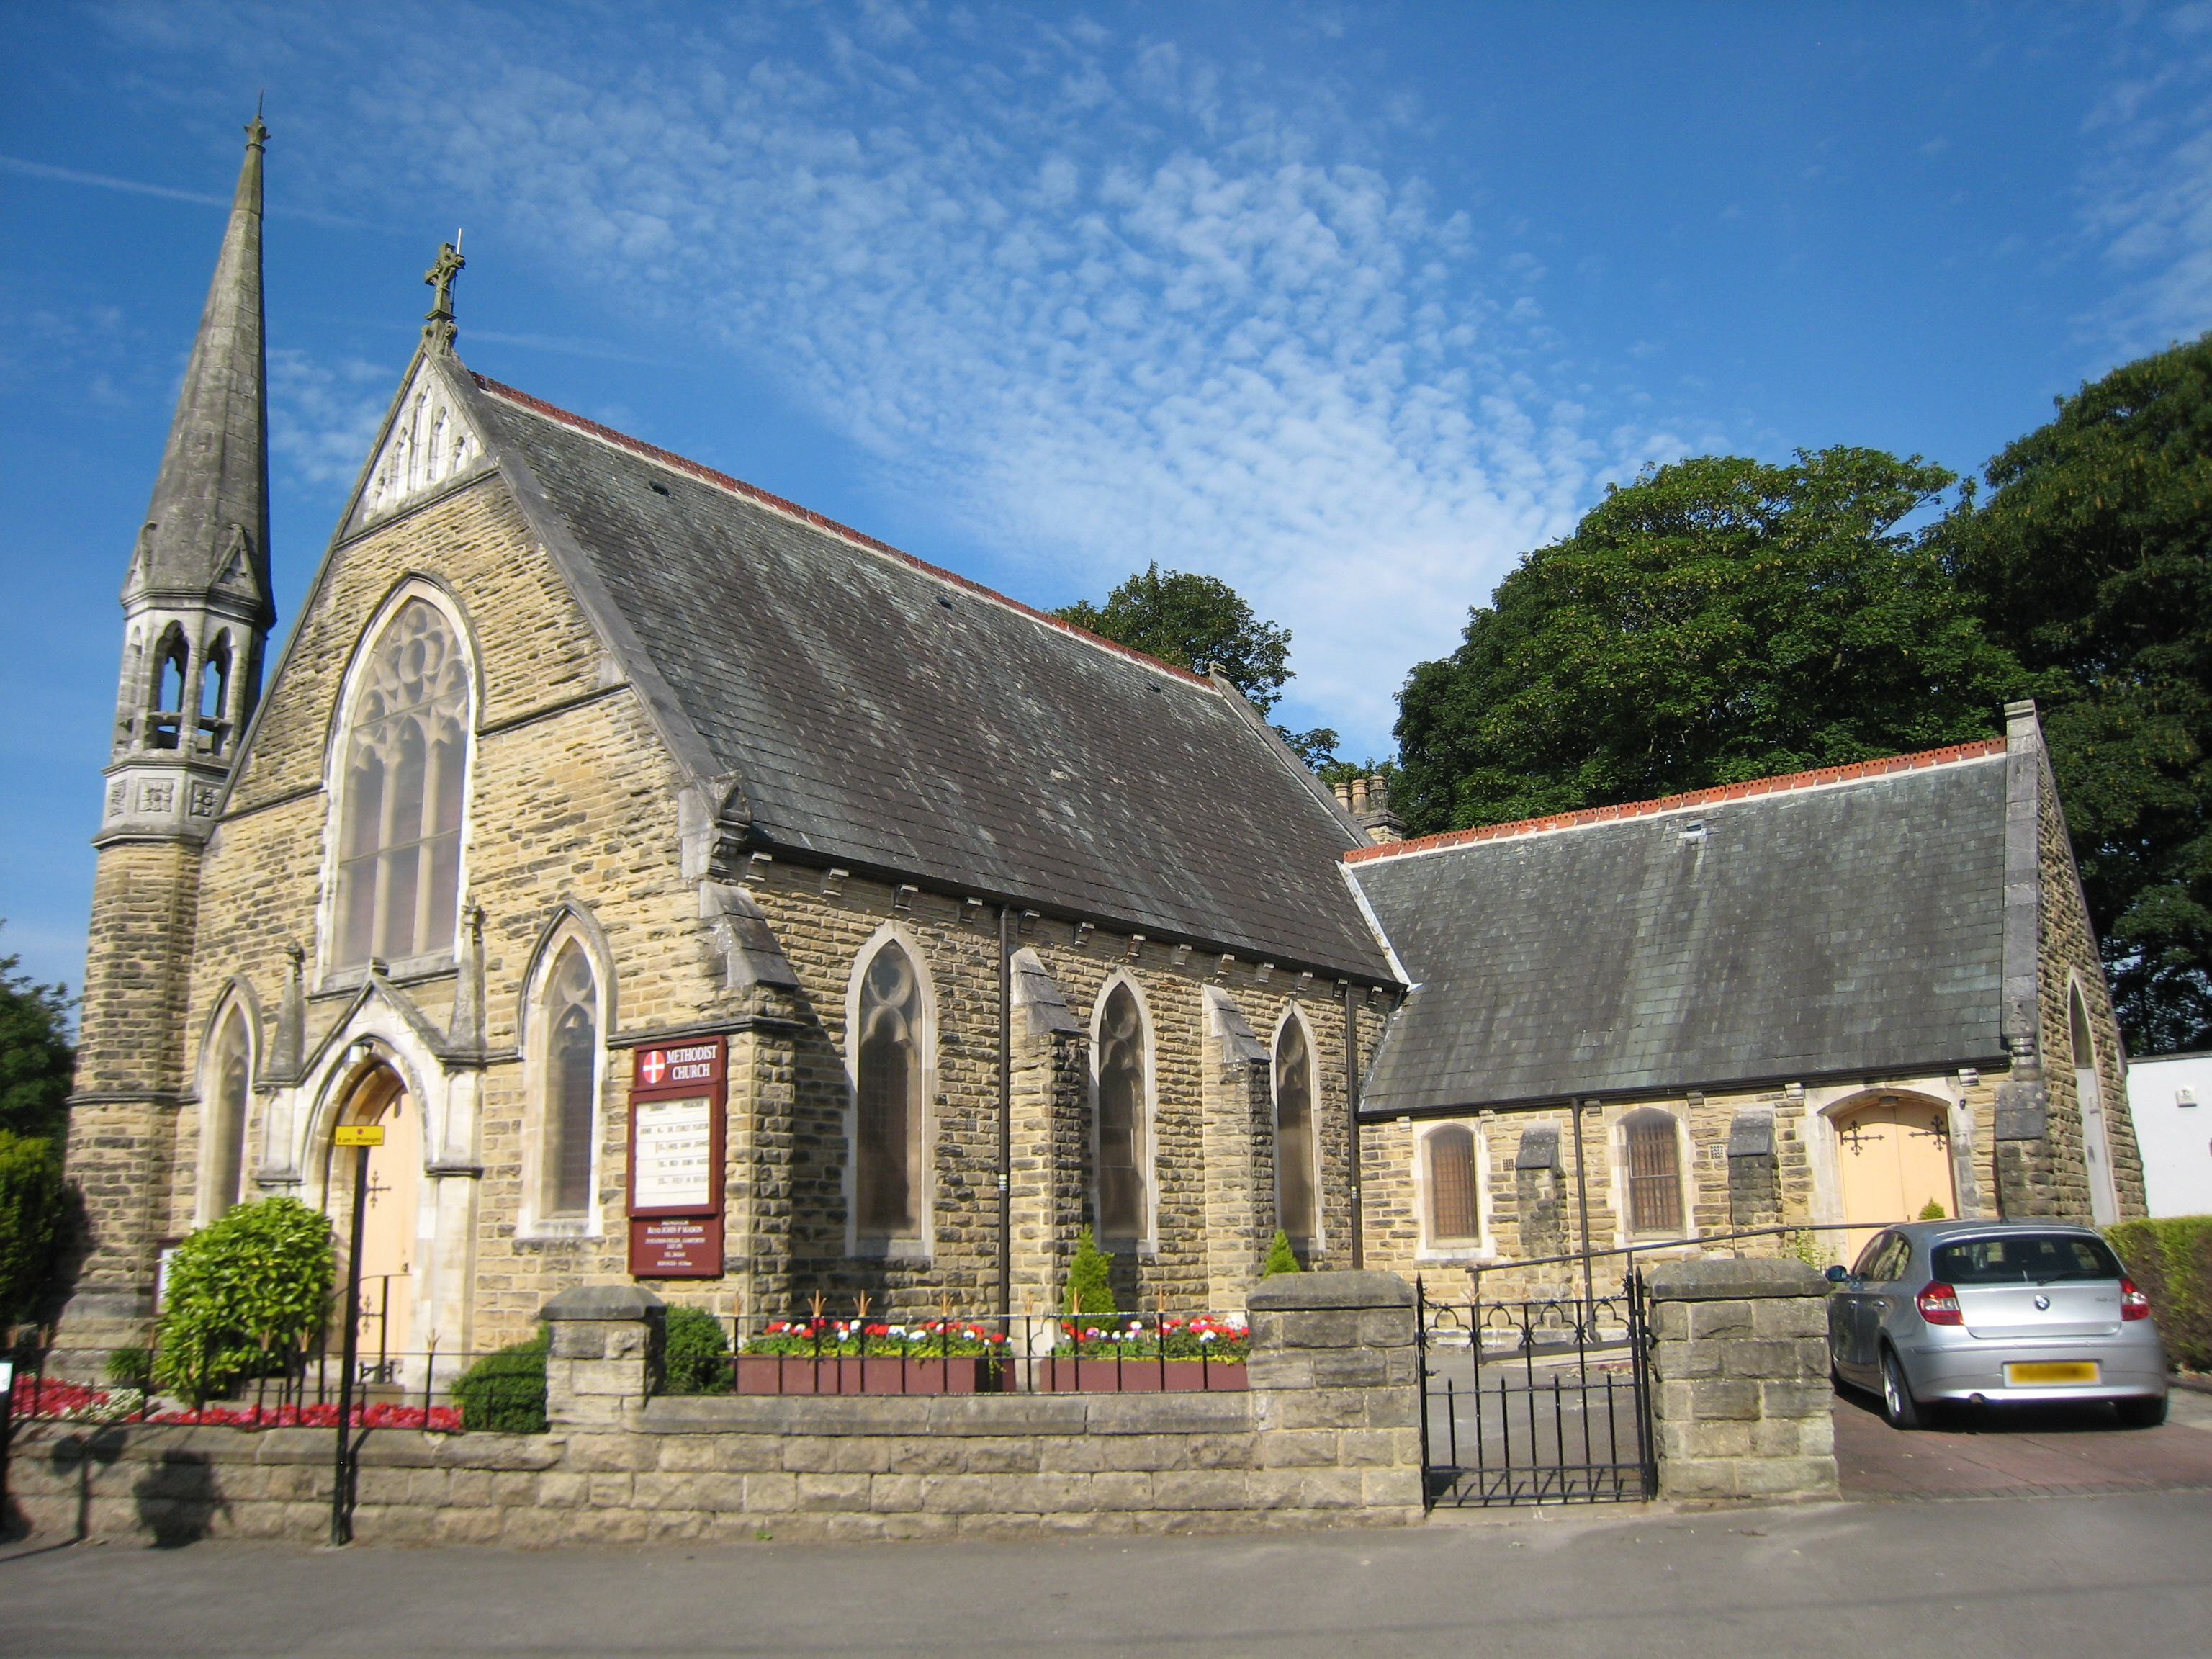 File:Barwick Methodist Church 14 June 2017.jpg - Wikimedia Commons